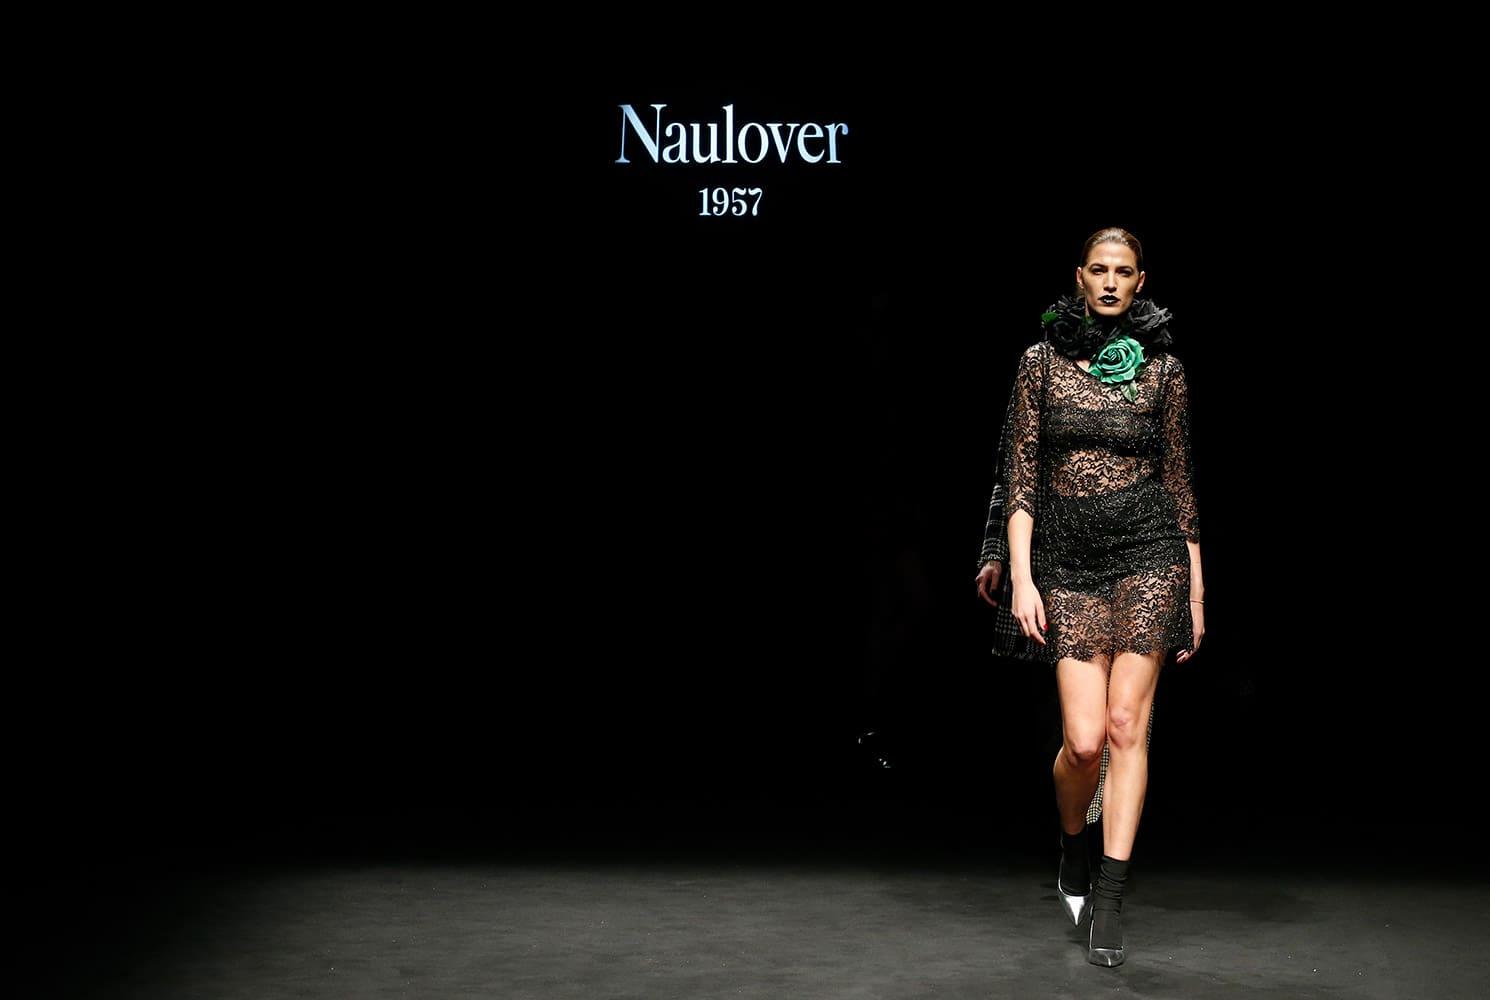 Naulover-11817